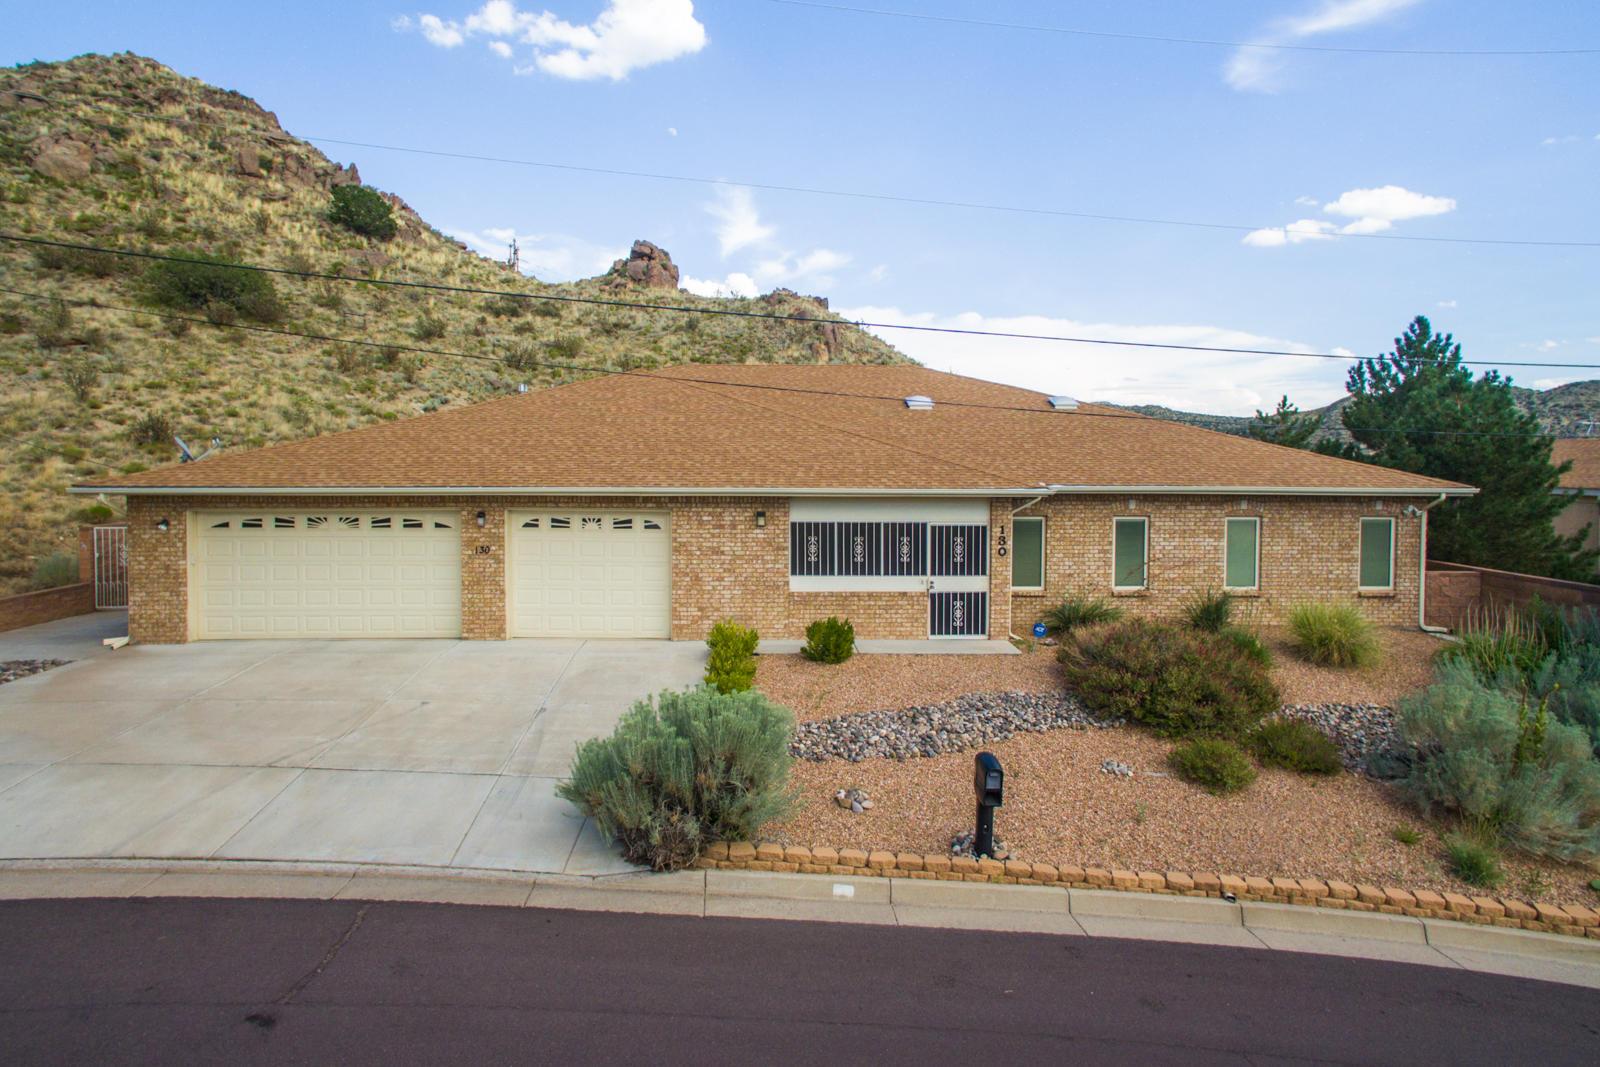 130 Camino de la Sierra NE, Albuquerque, NM 87123 - Albuquerque, NM real estate listing